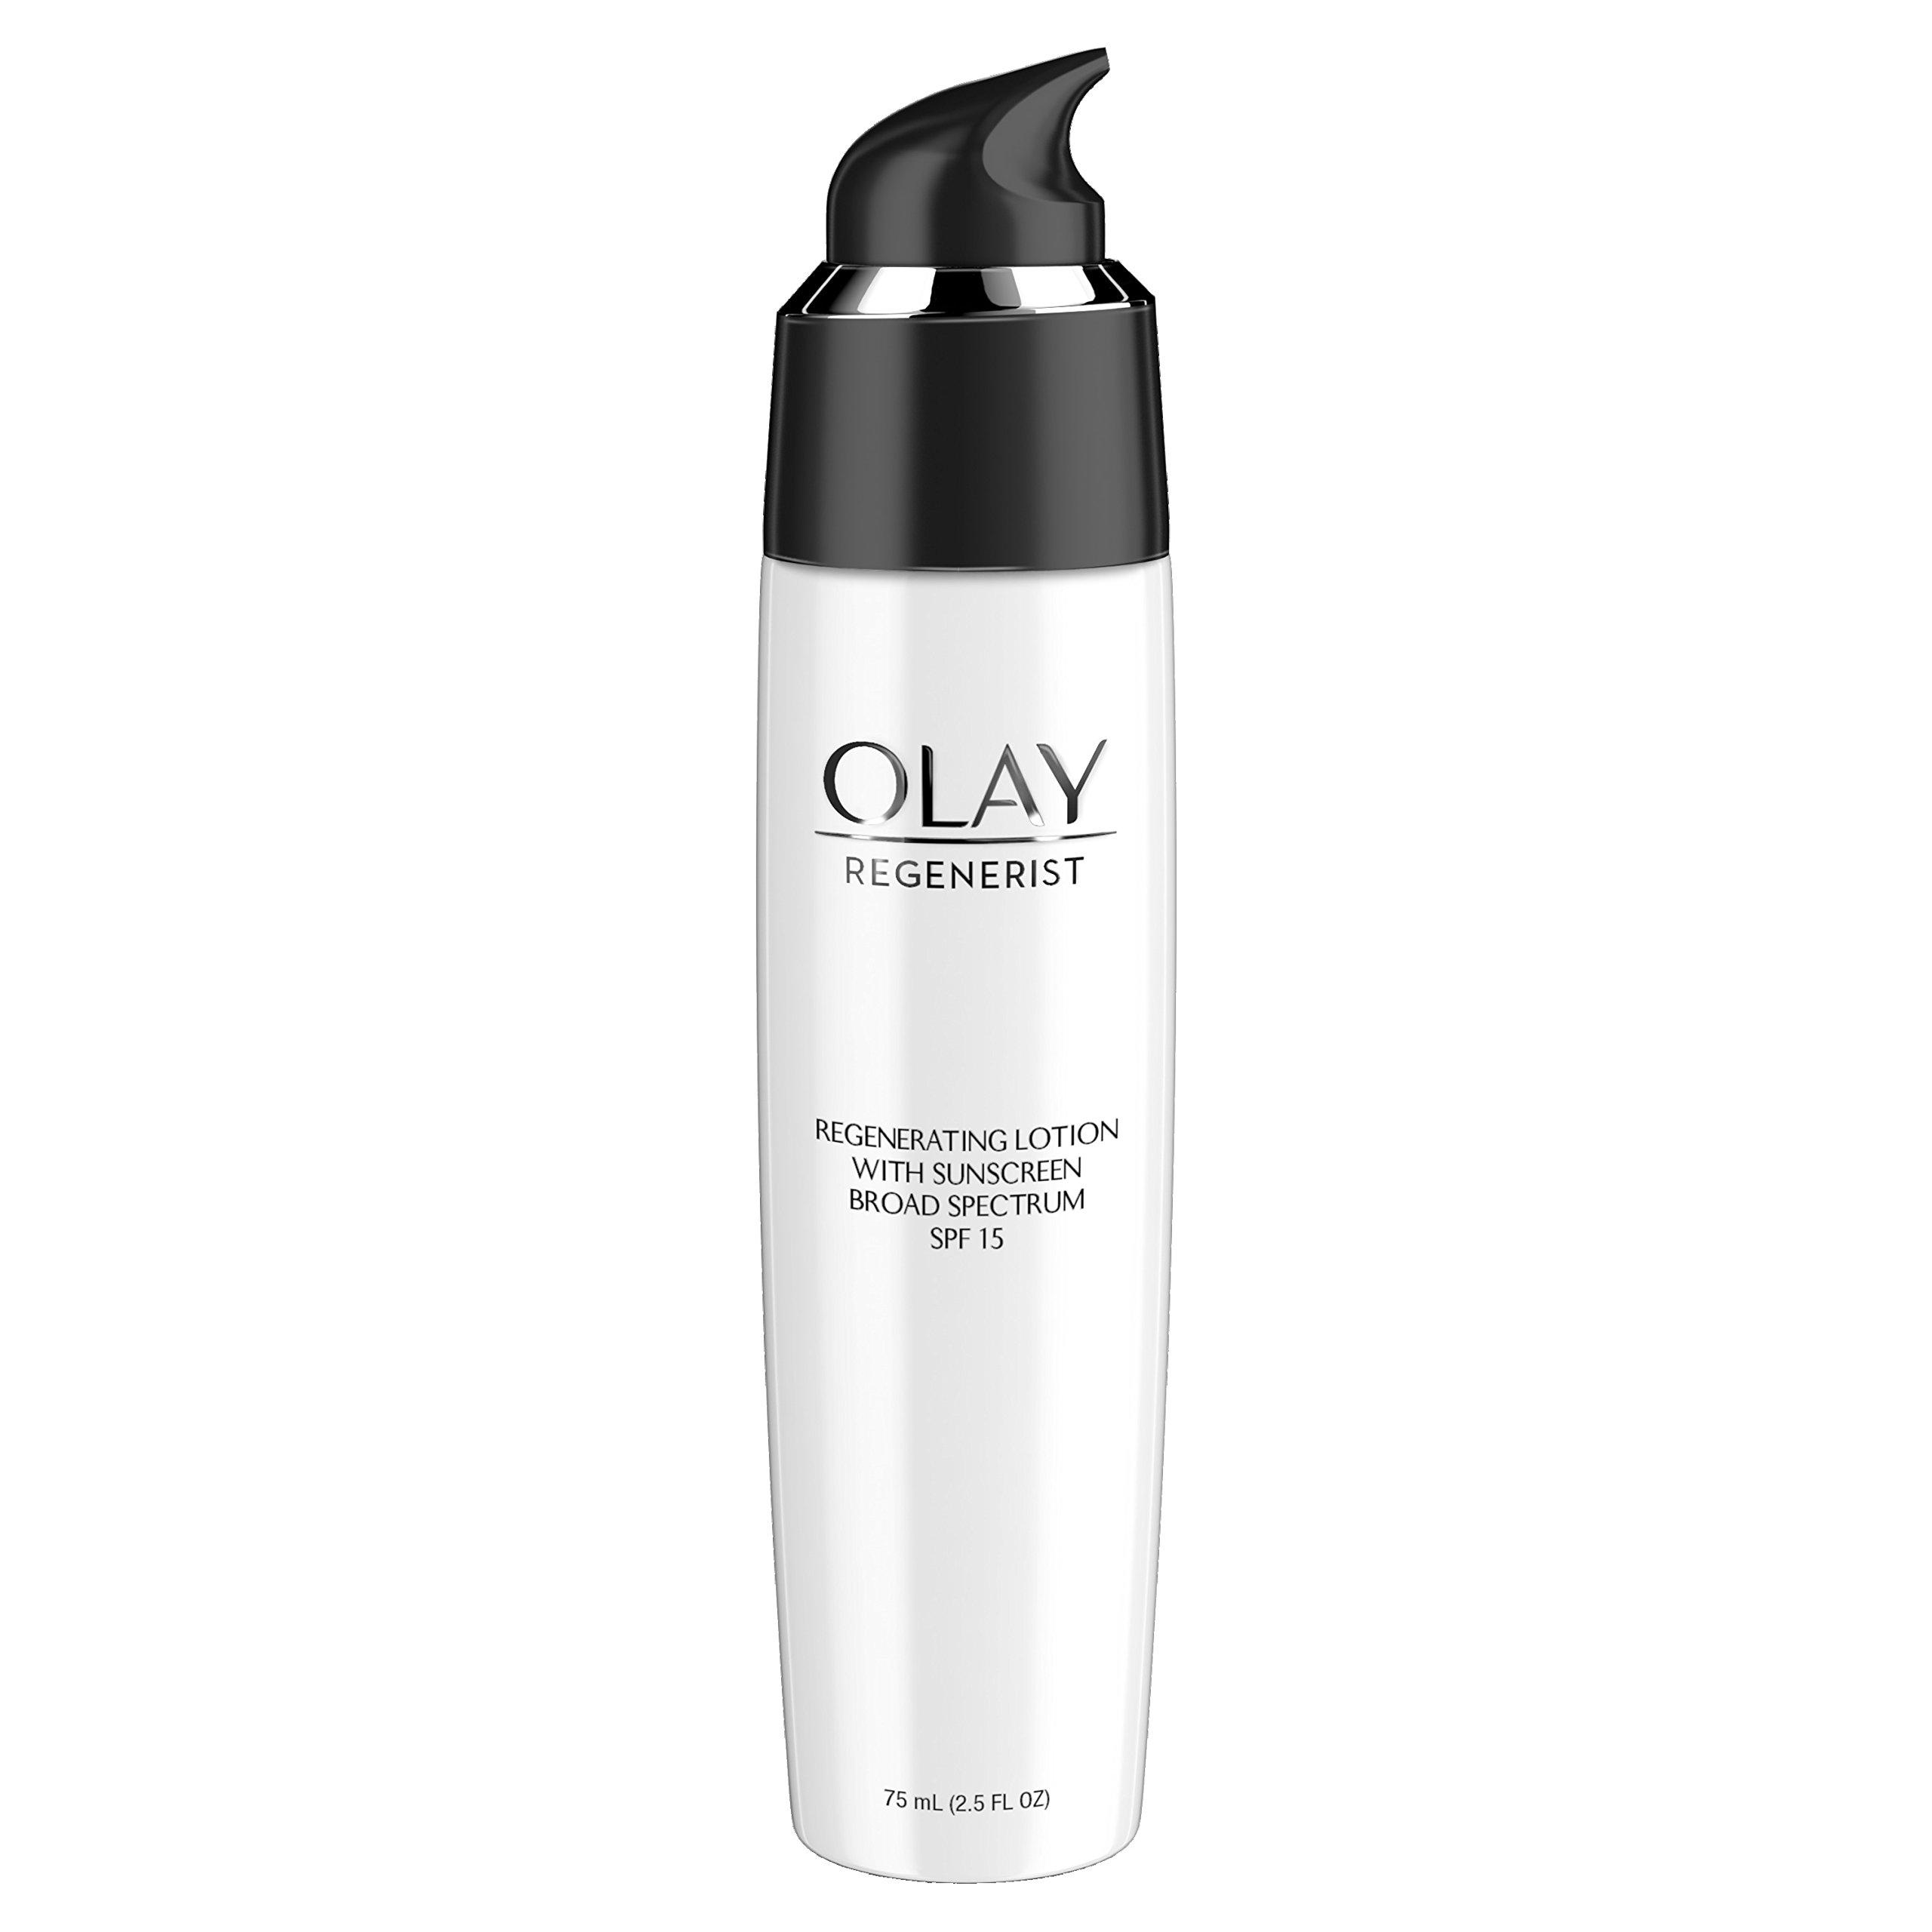 Olay Regenerist Enhancing UV Lotion Advanced Anti-Aging 75ml